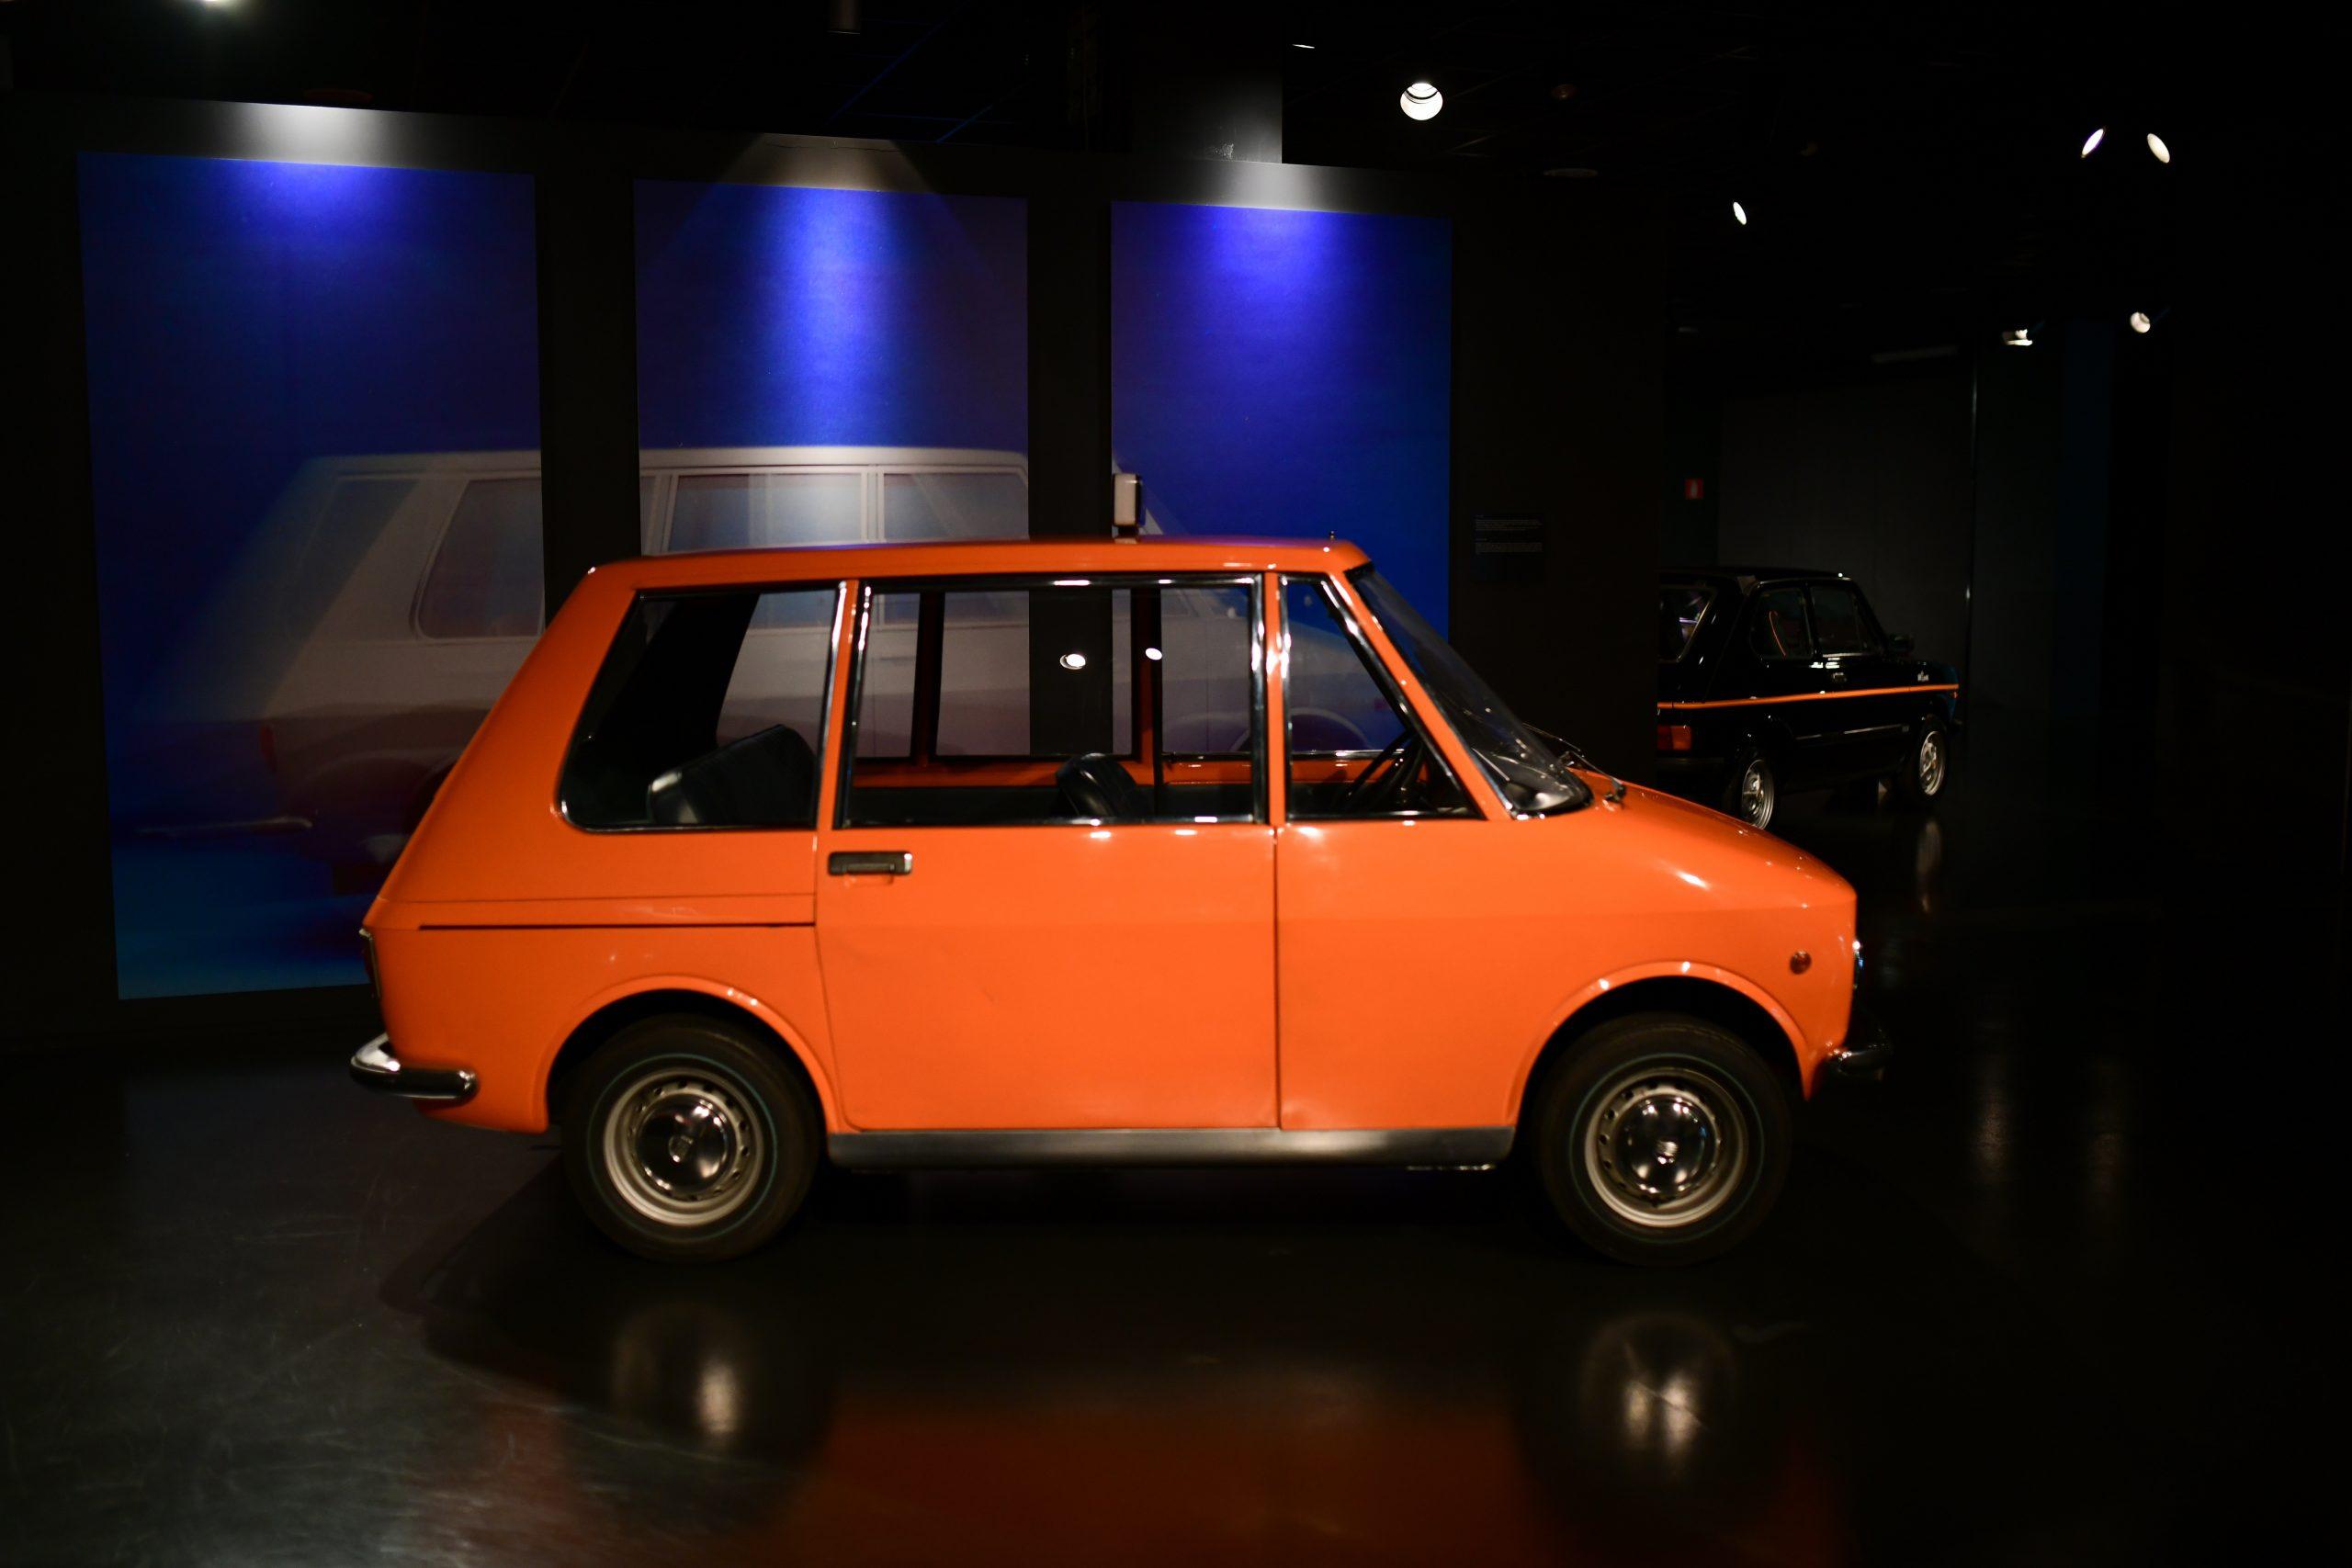 04 Fiat City Taxi scaled H Fiat, o ιδιοφυής σχεδιαστής και ένα περίεργο ταξί Fiat, retro, ειδήσεις, Νέα